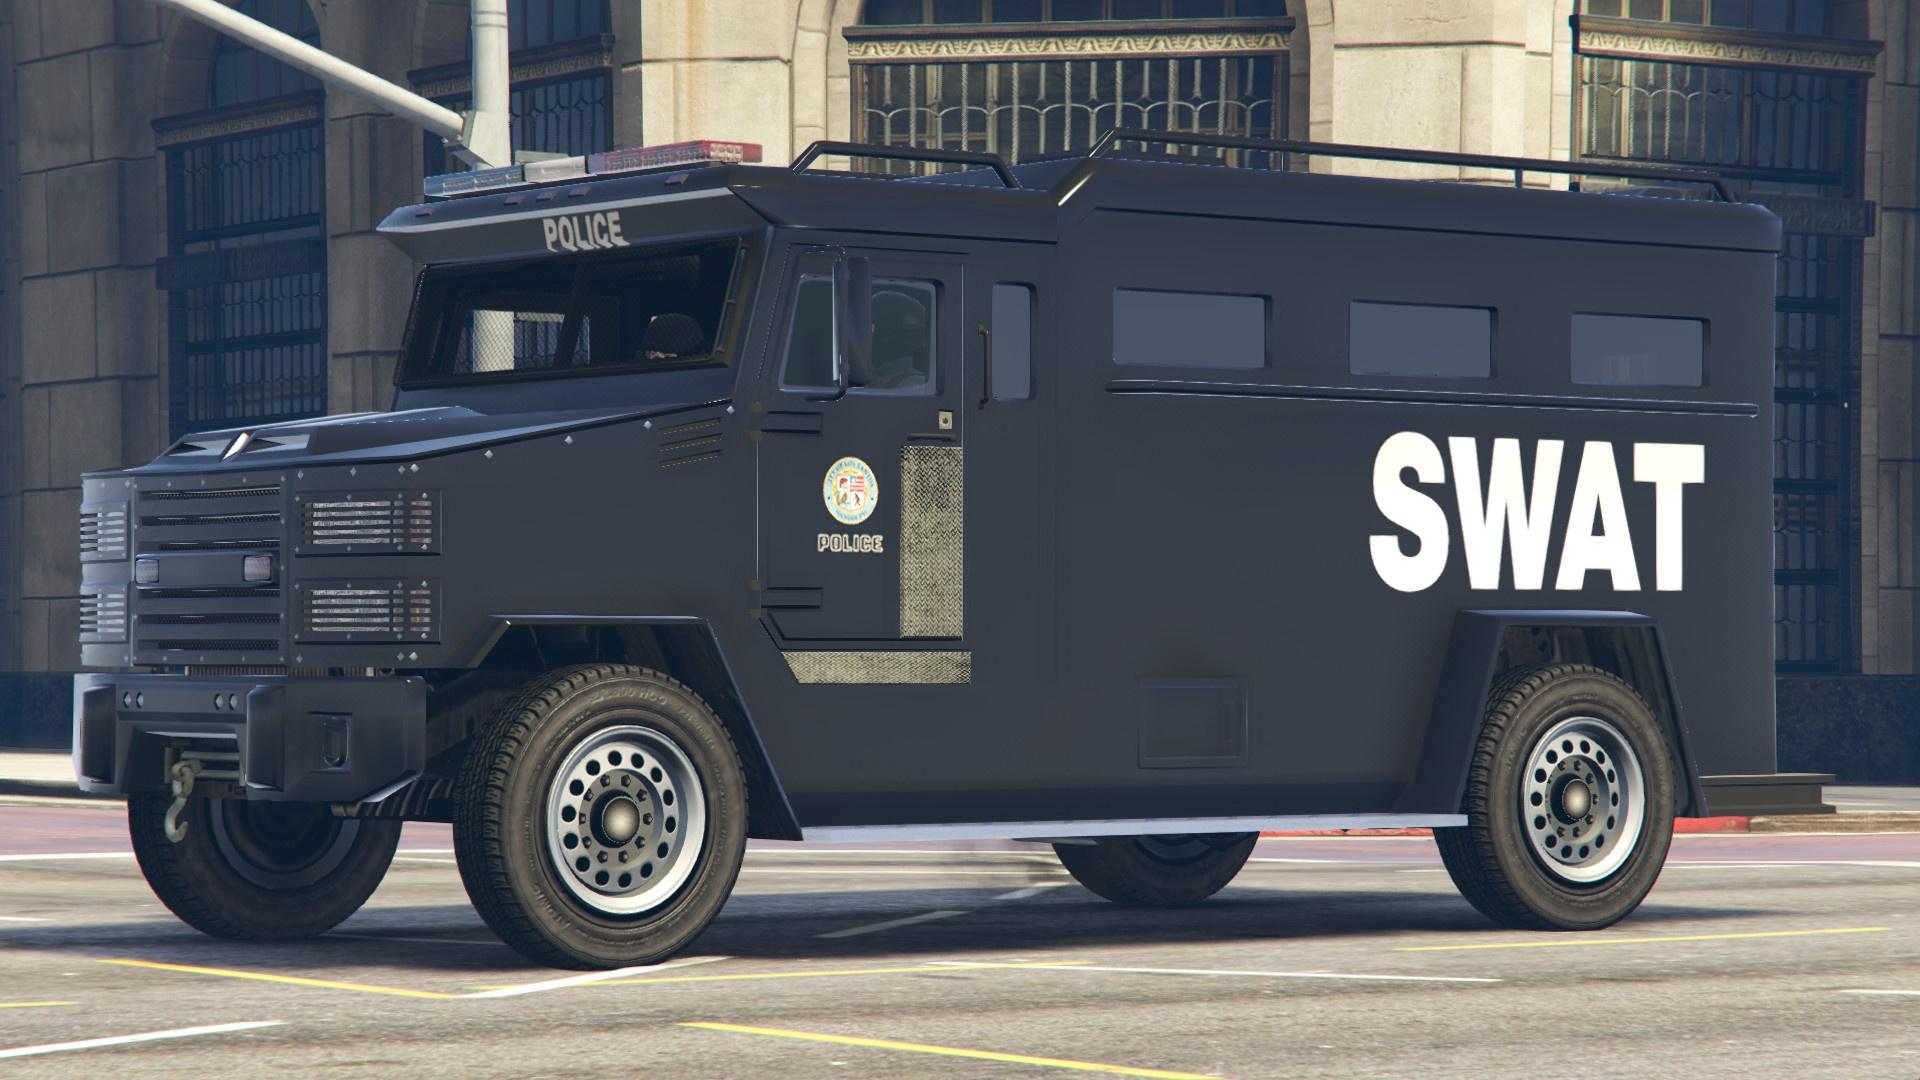 LSPD SWAT Truck Livery Brute Police Riot Truck (4K) - GTA5